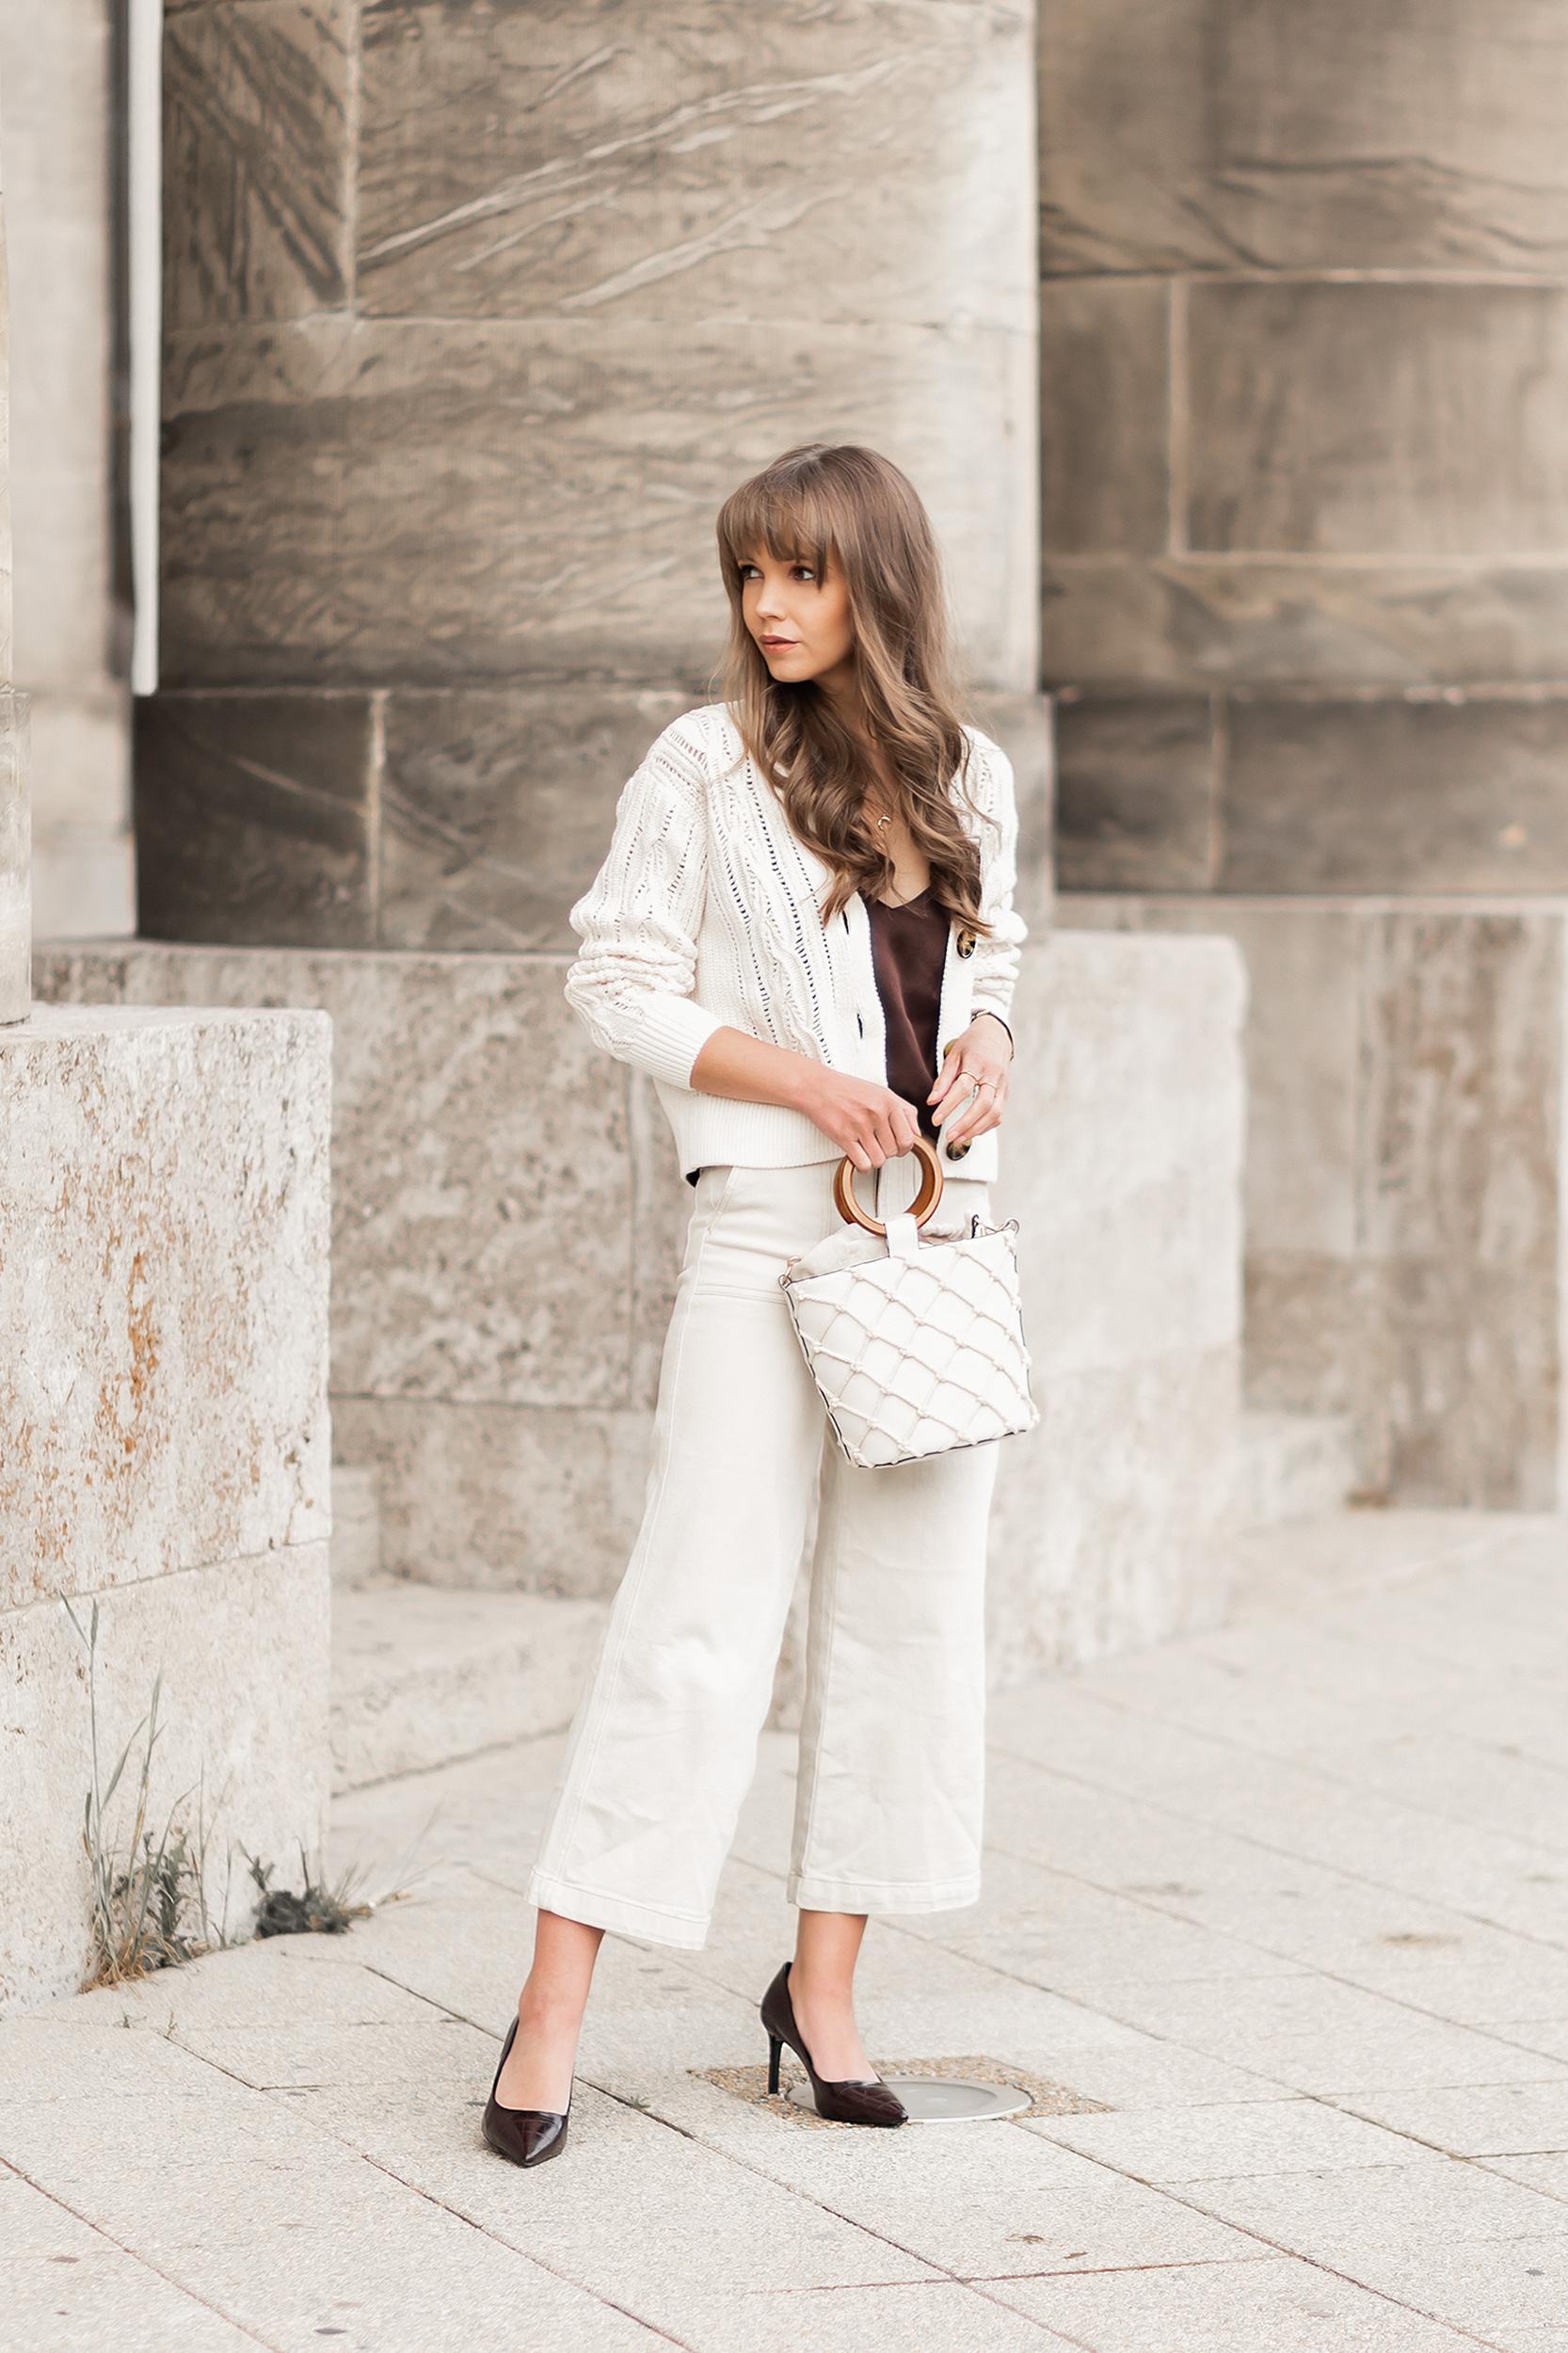 Cardigans im Frühling stylen, Modetrend 2020, Granny Cardigans, Styling-Tipps für Cardigans, Jeans Culotte, bezauberndenana.de